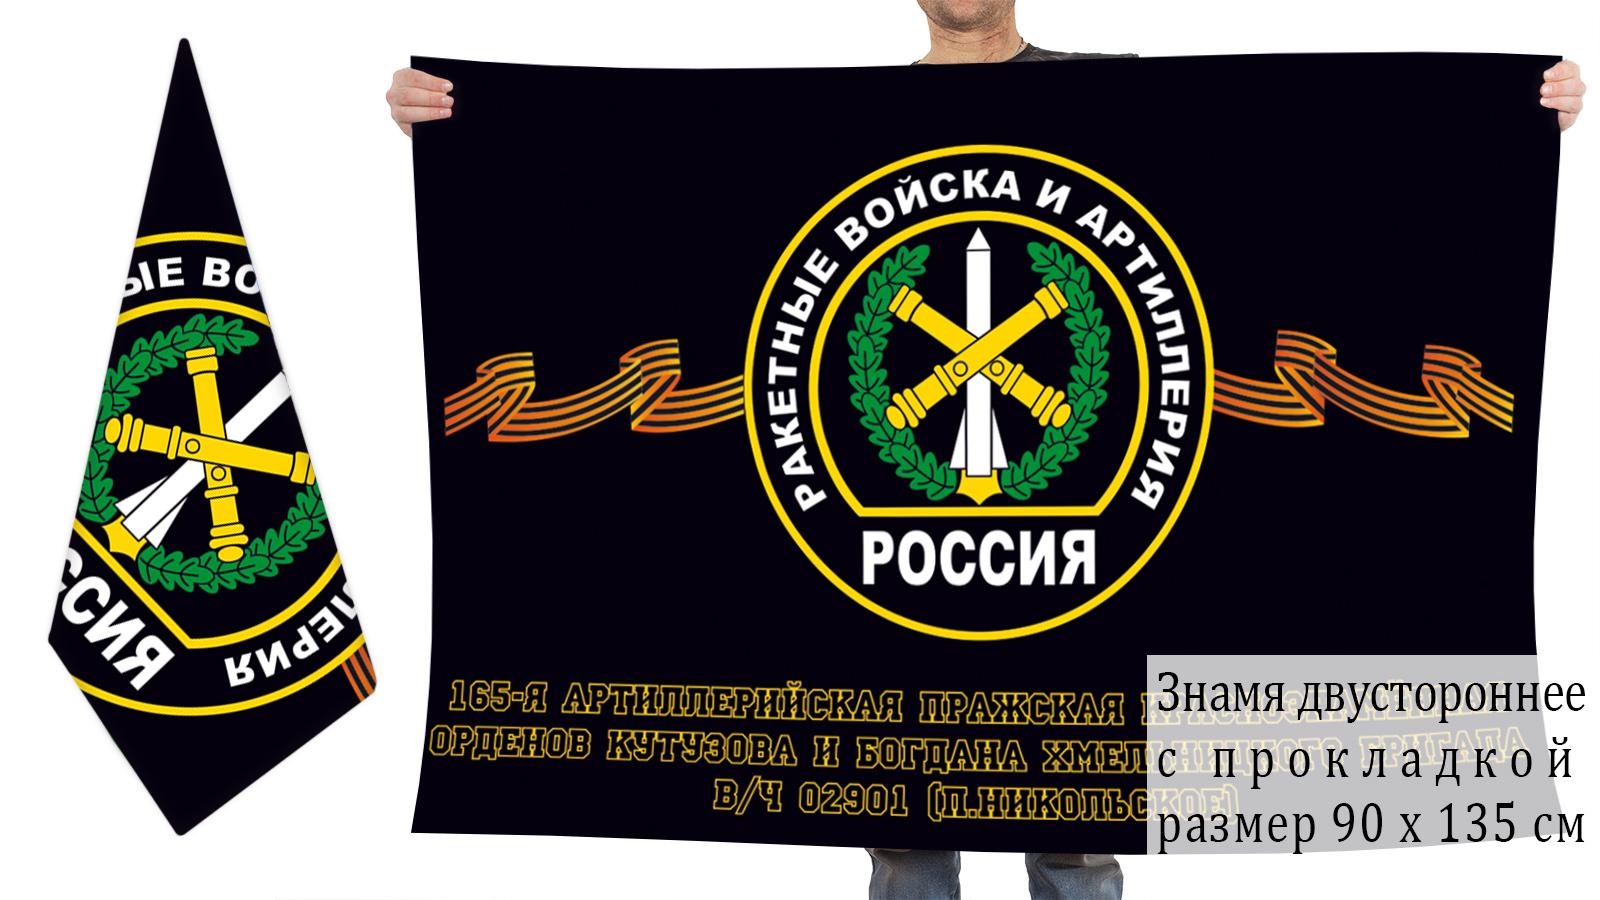 Двусторонний флаг РВиА 165 Пражской артиллерийской бригады